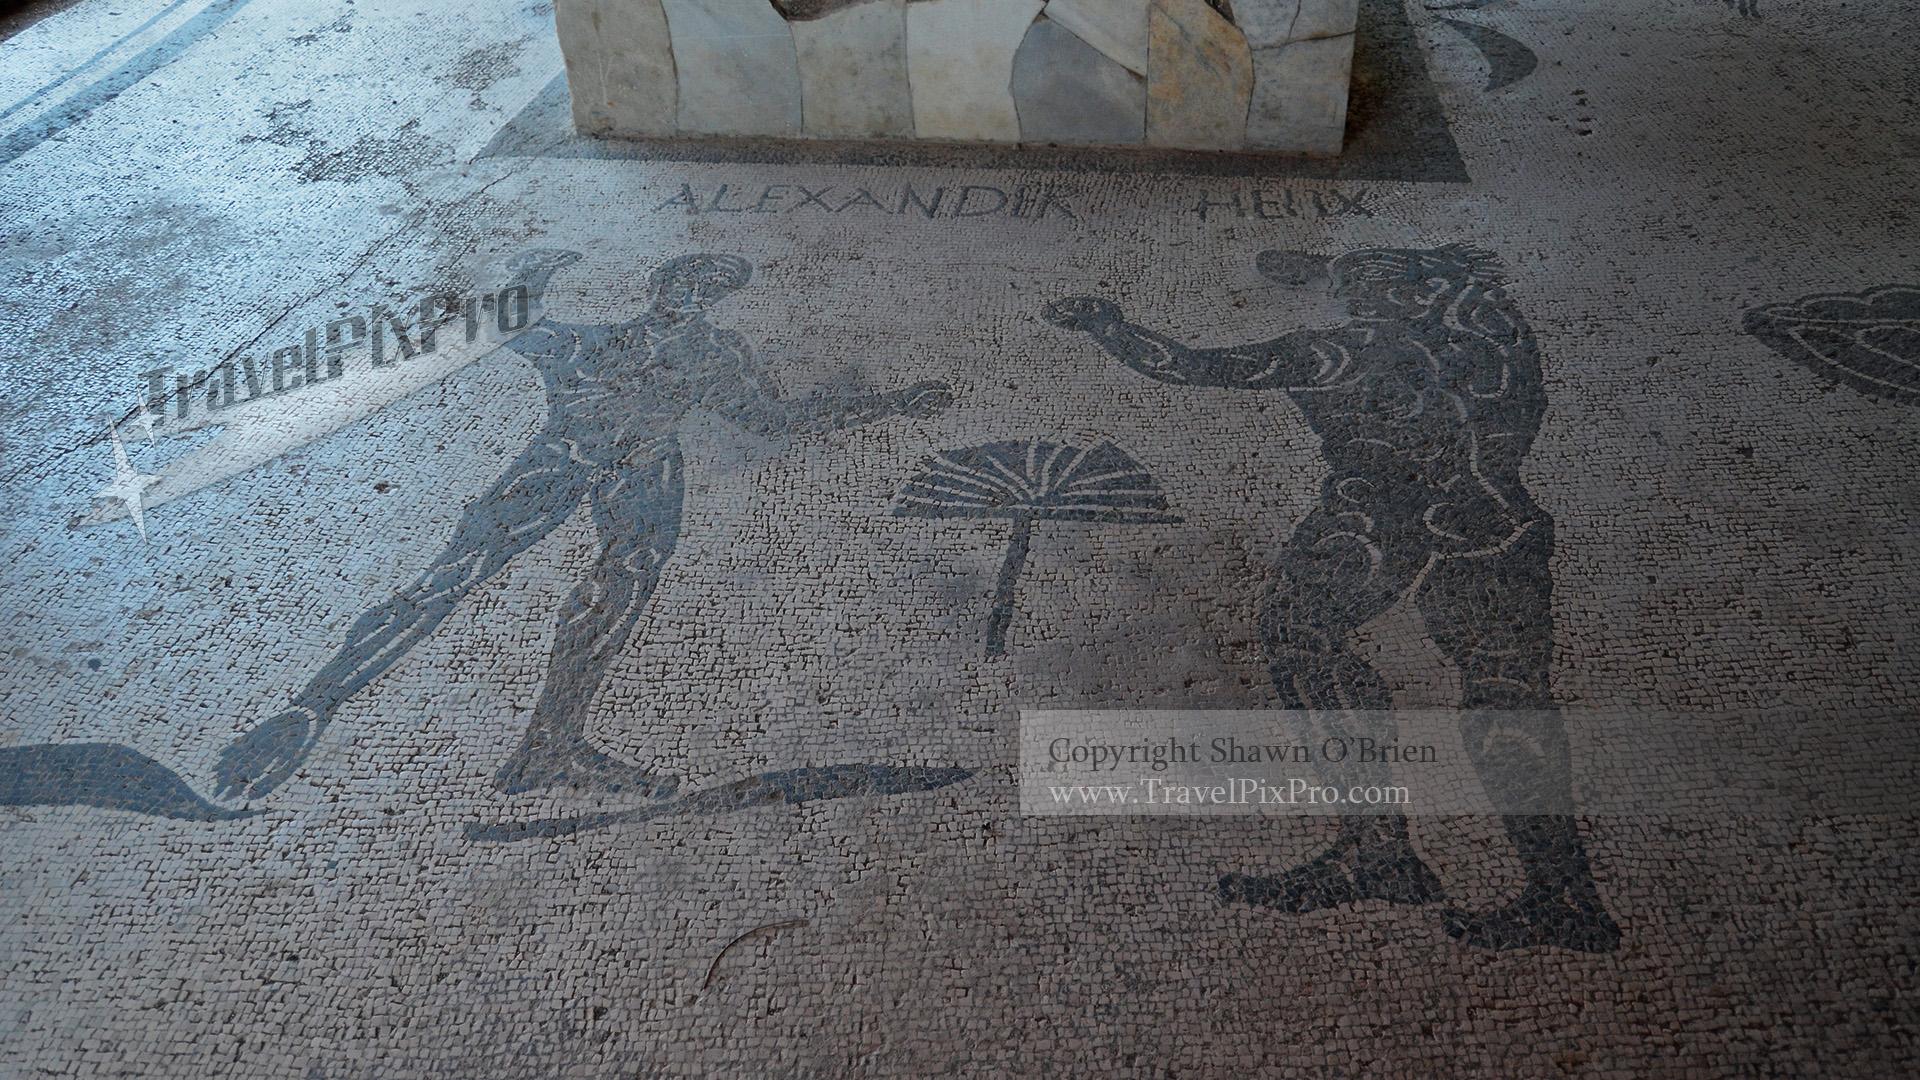 Caupona di Alexander Helix Mosaic